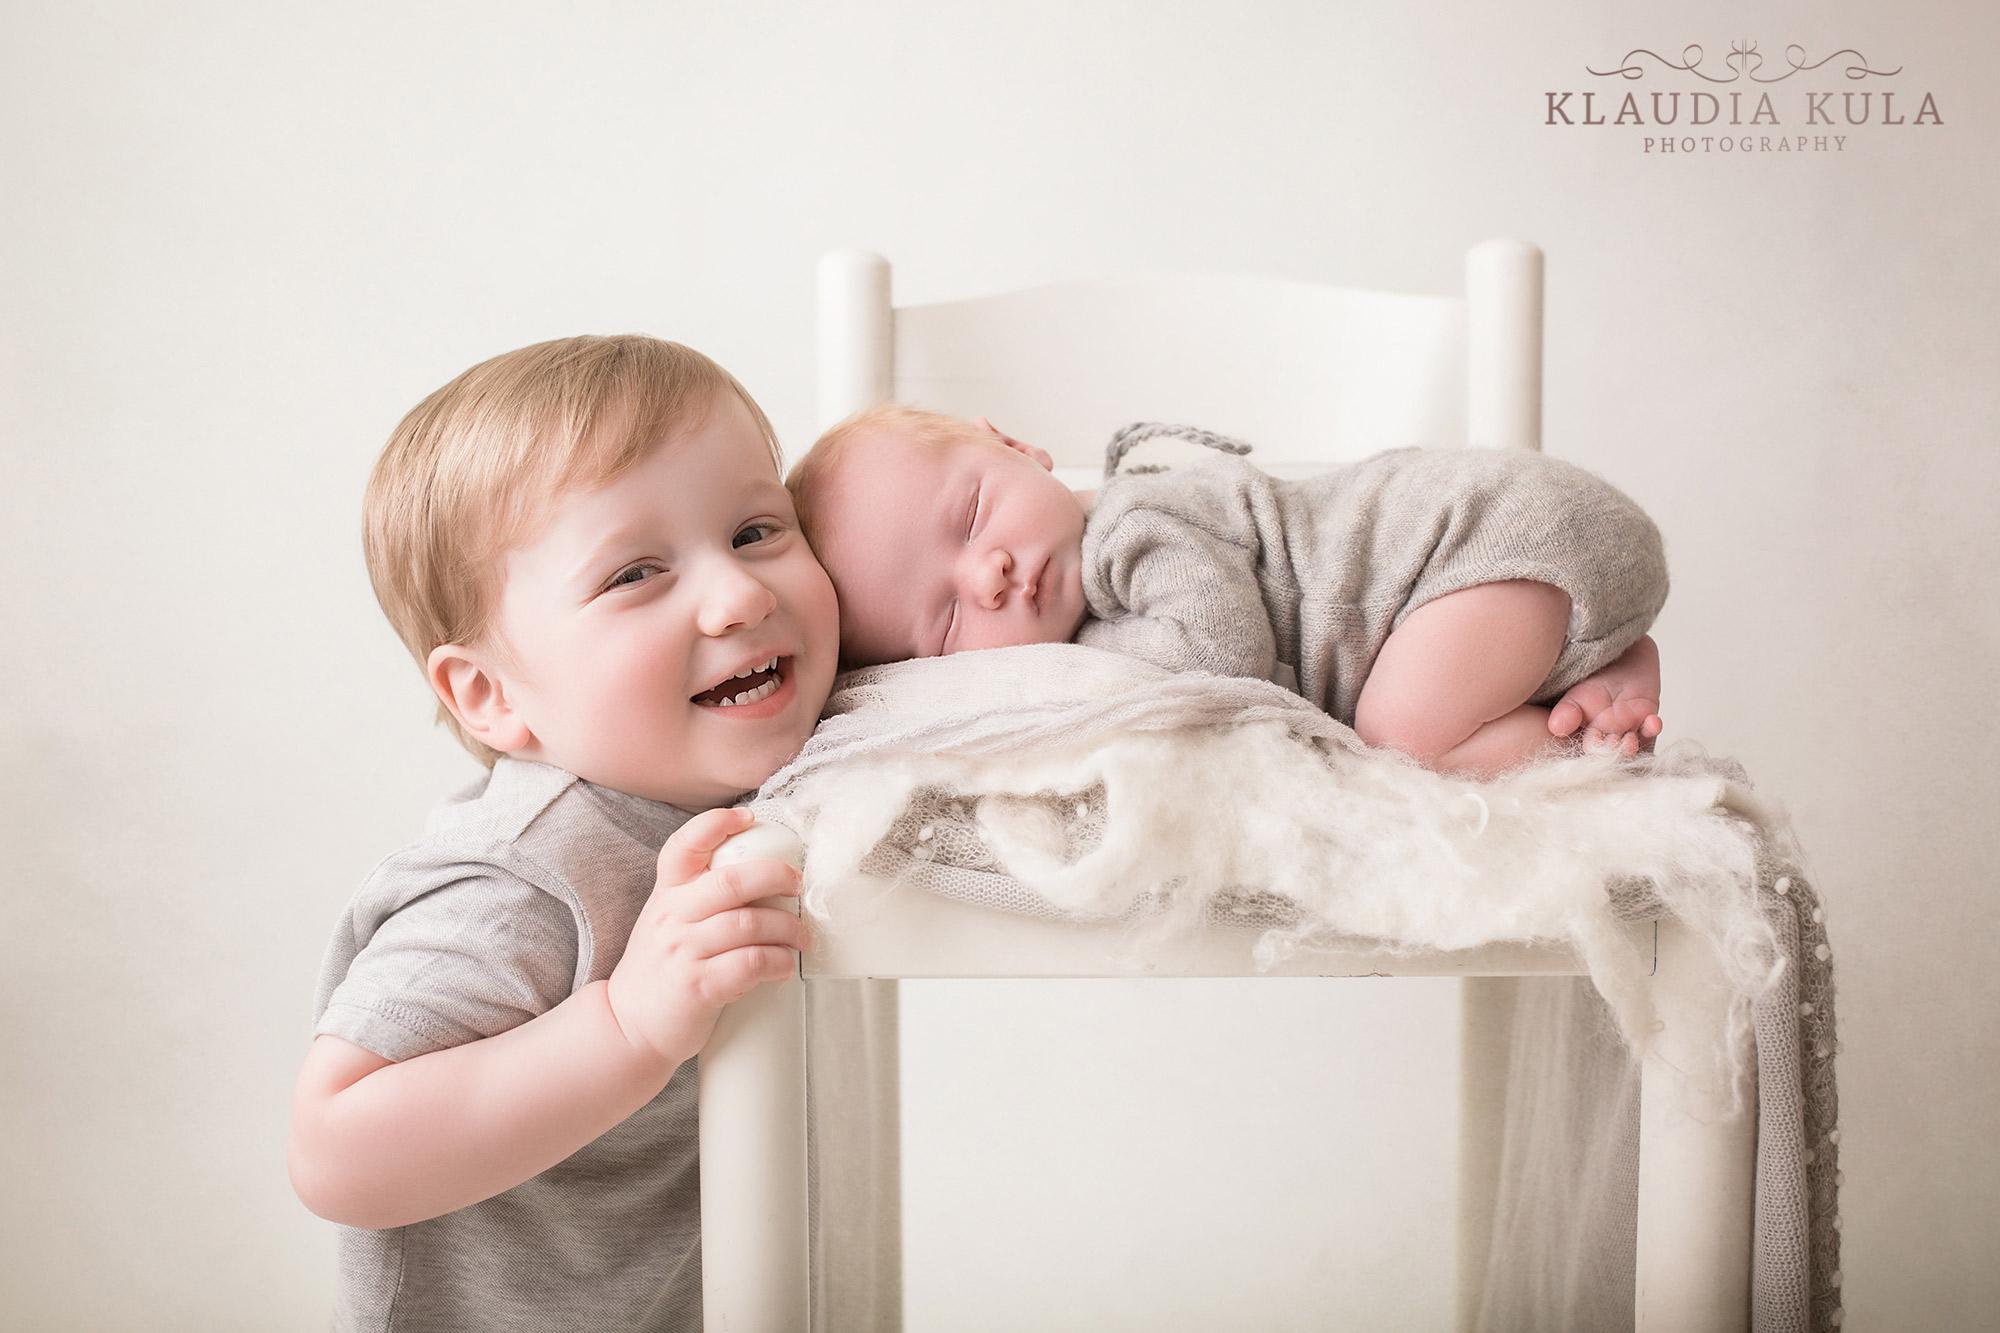 Klaudia-Kula-Photography-newborn-baby-ch